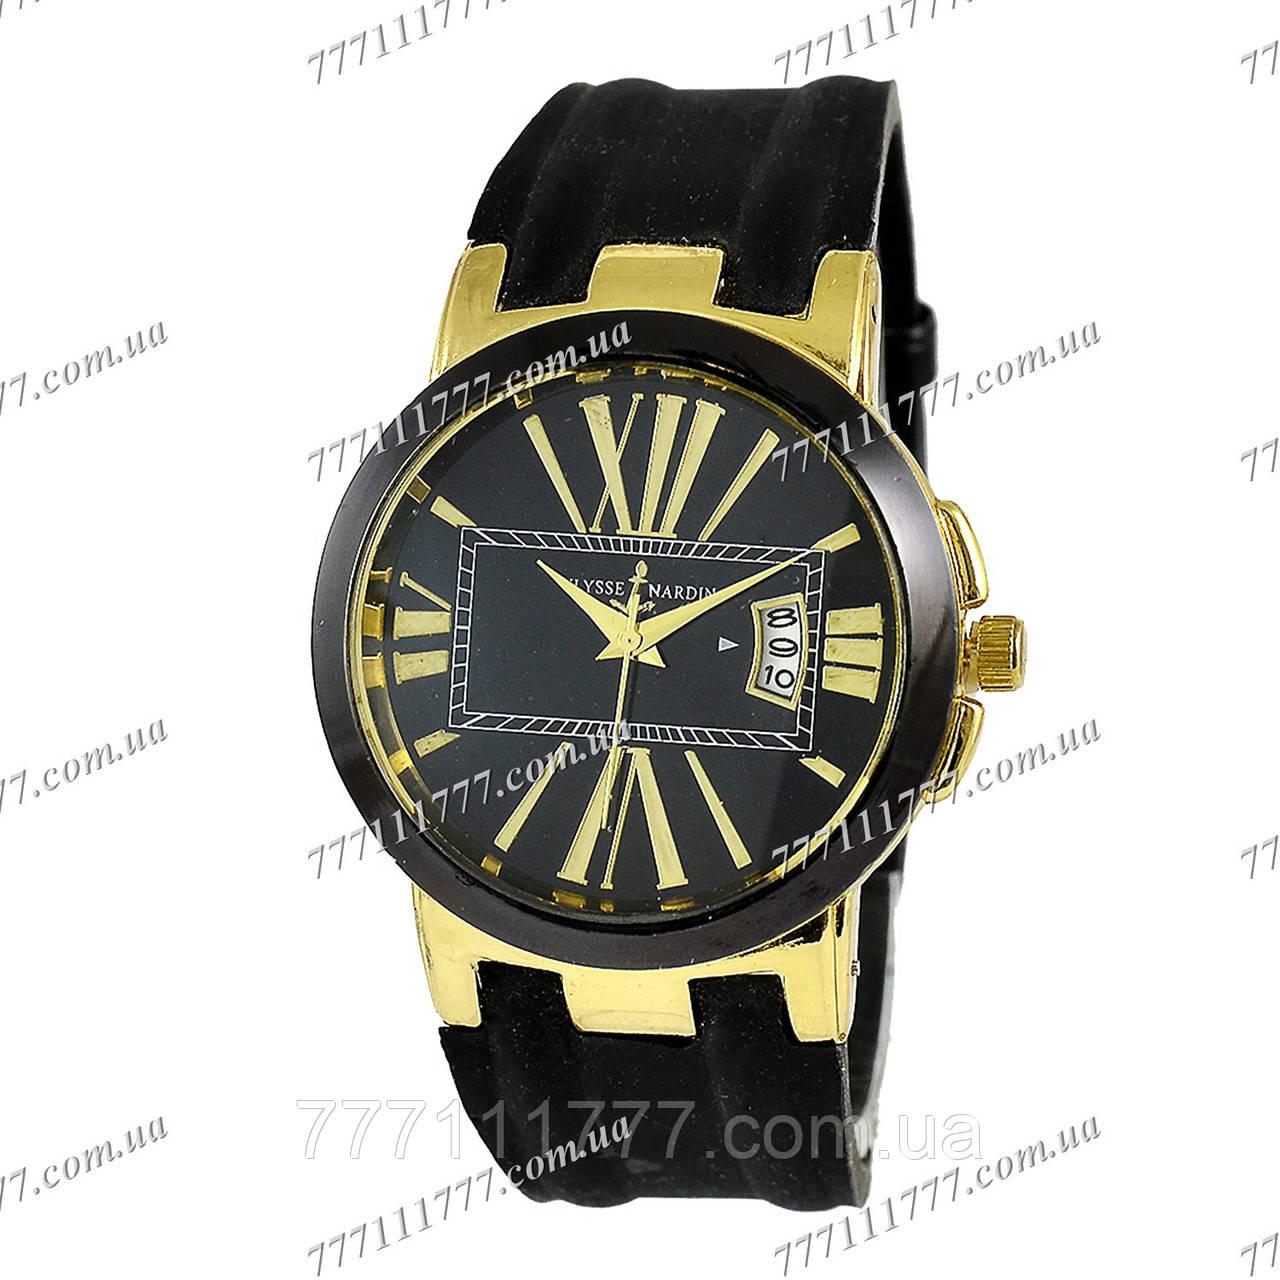 Часы мужские наручные Ulysse Nardin SSVR-1023-0103  продажа, цена в ... a51b28954af